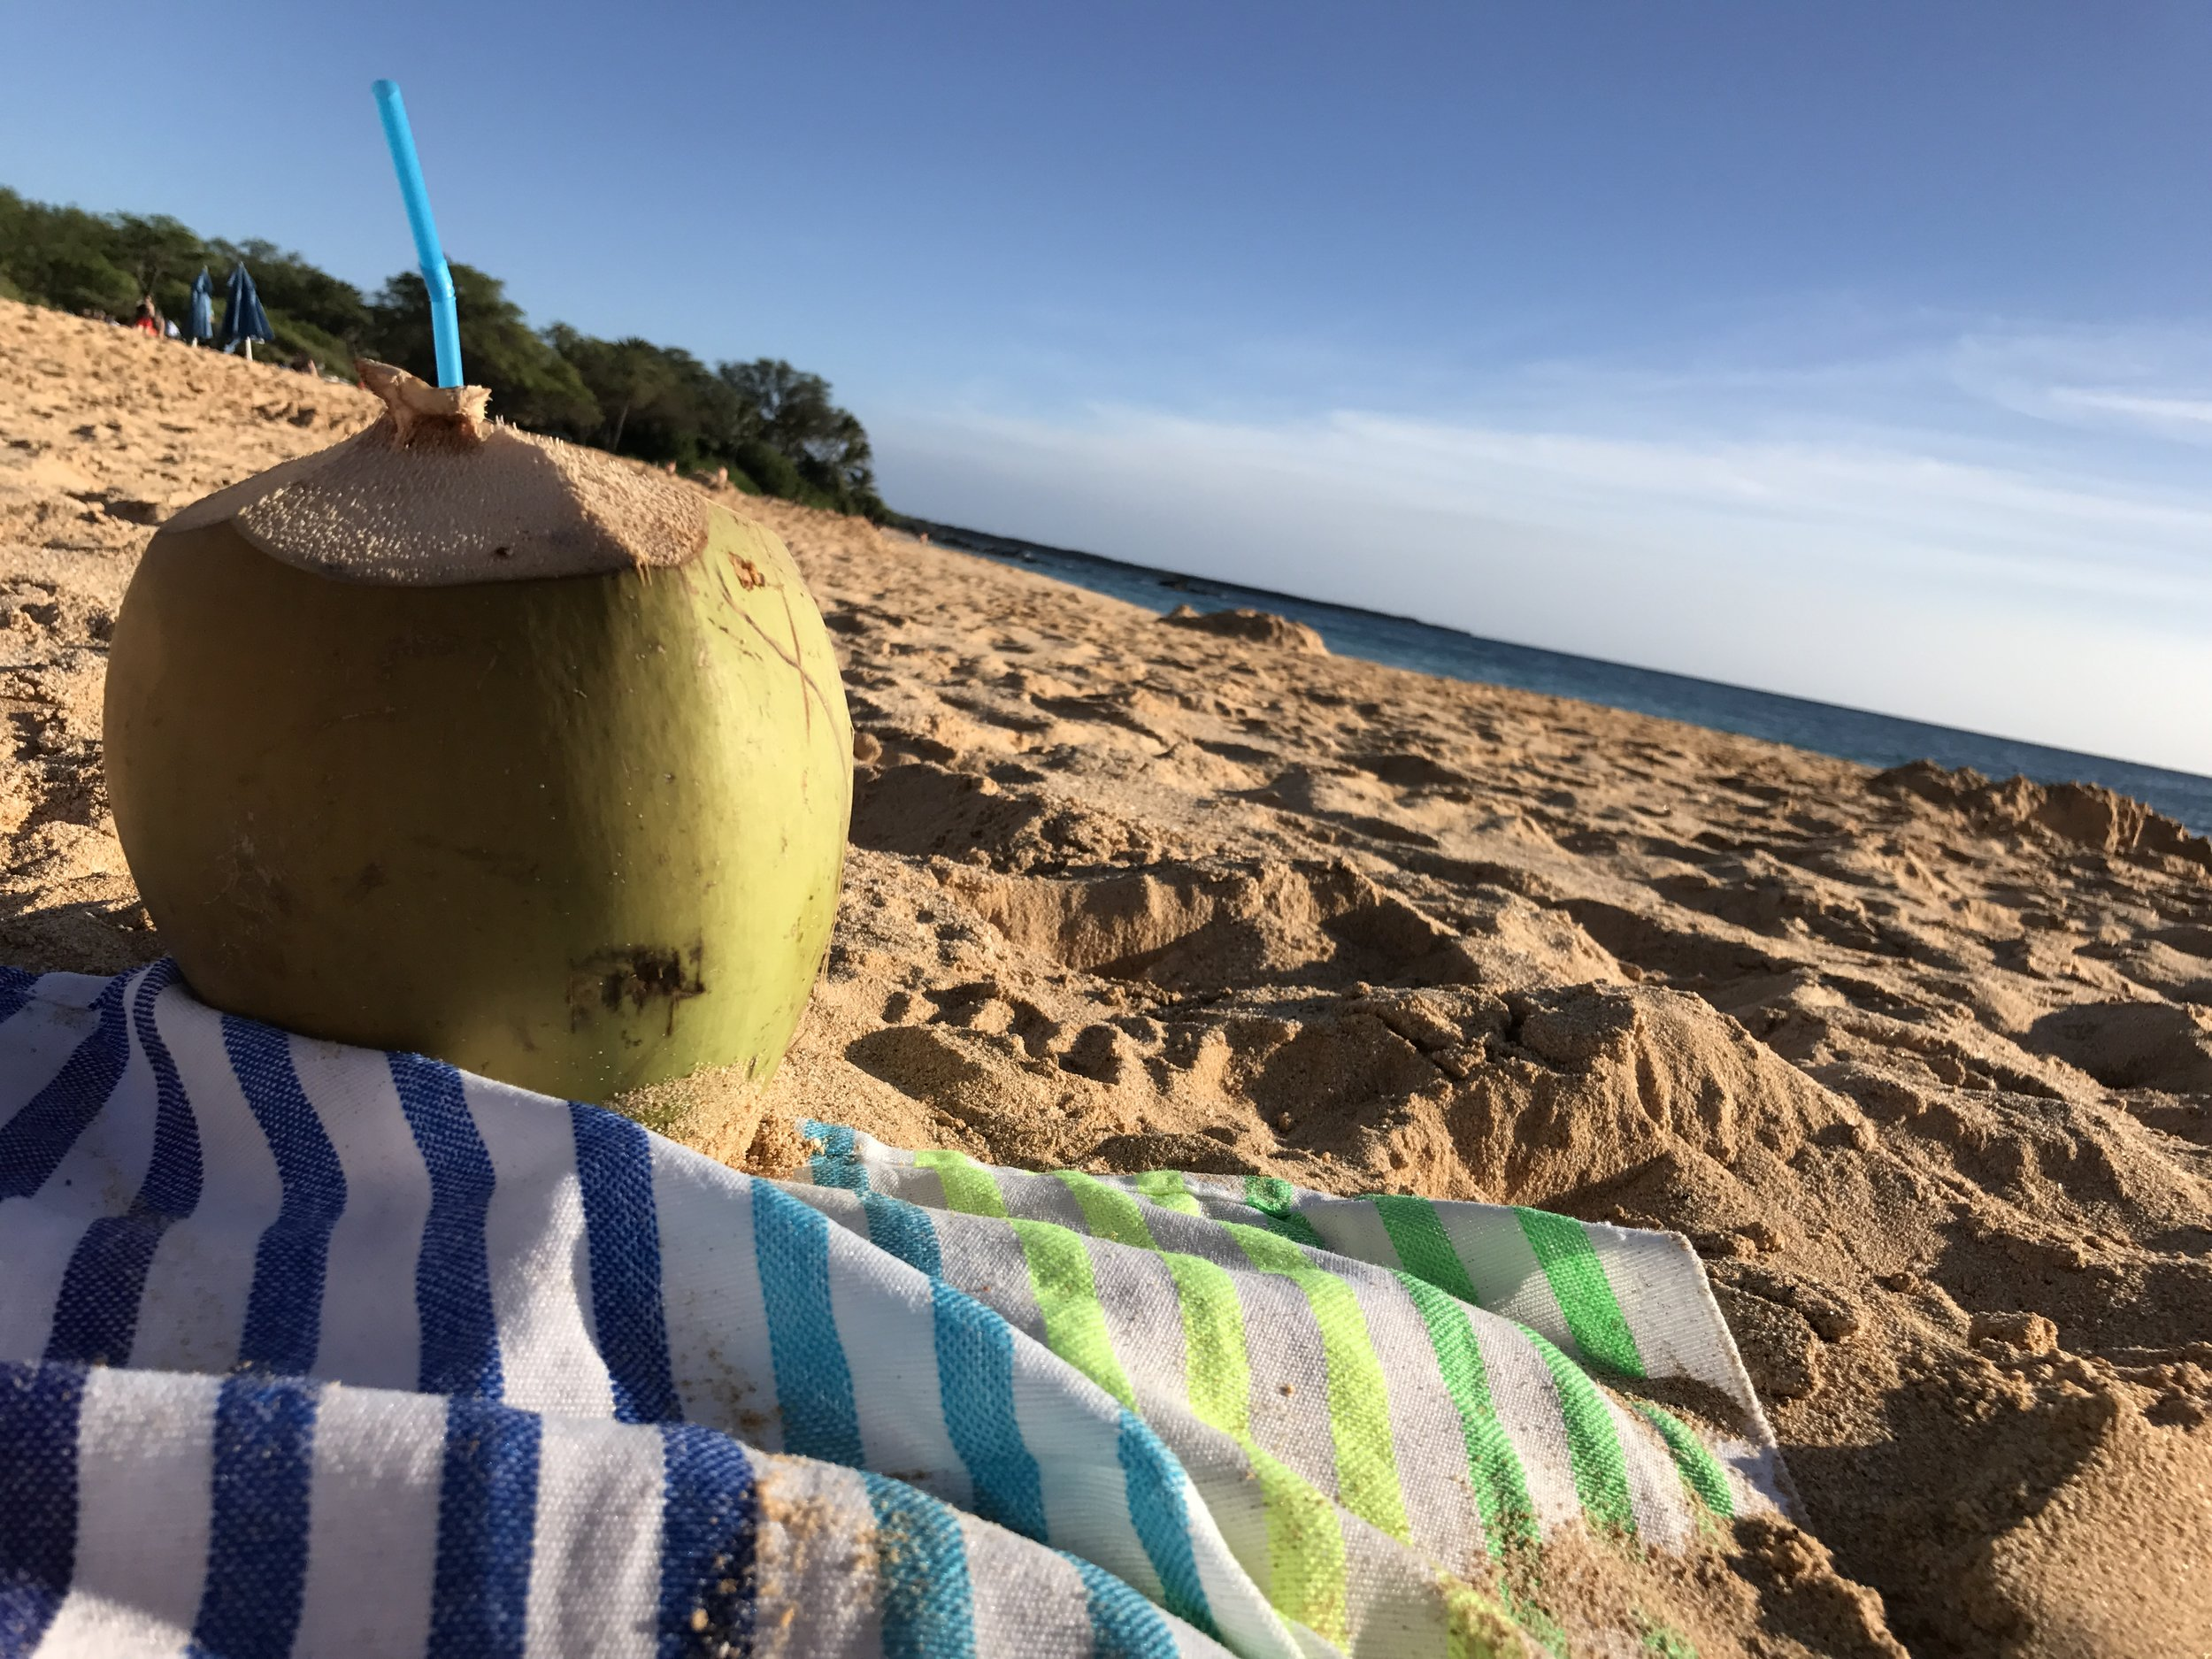 maui beach vibes coconut water tropical getaway